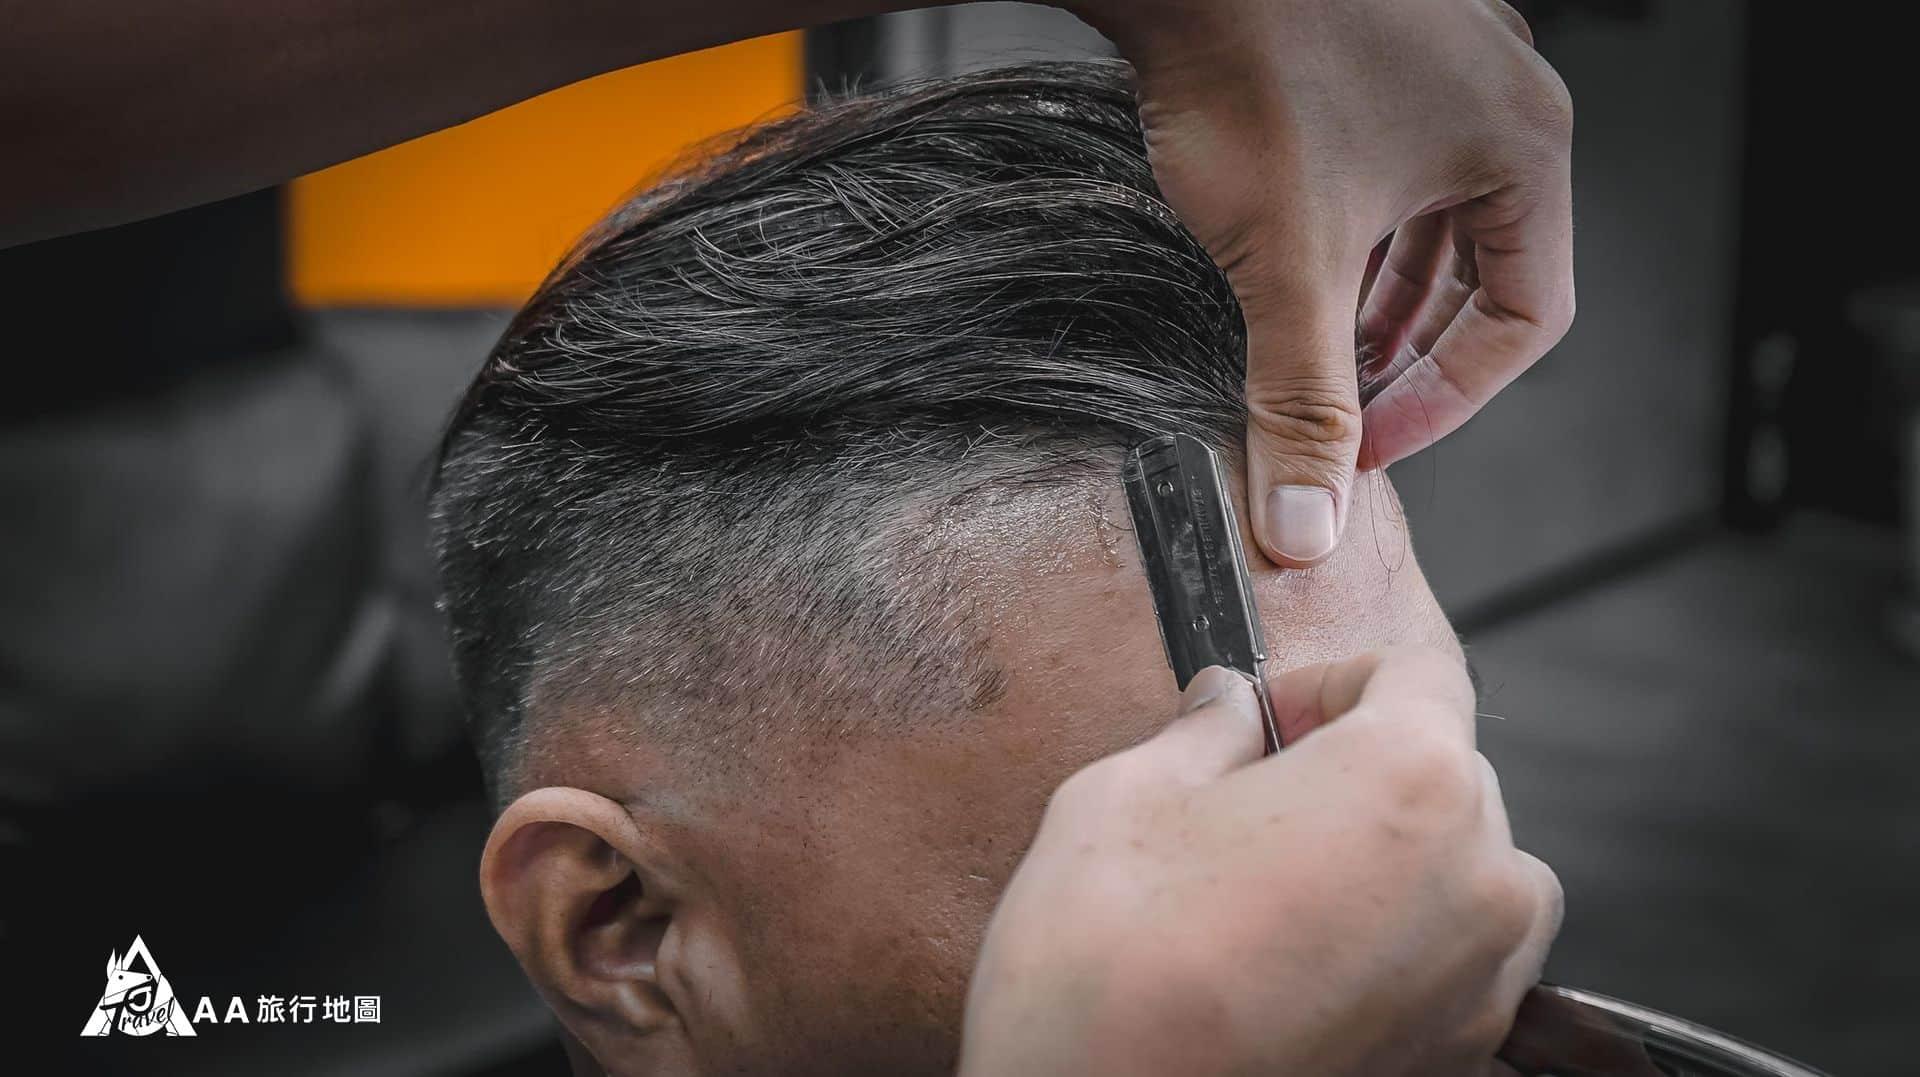 HomeComing 很久沒有遇到有用剃刀的店家了,比一般外面用推剪的爽度就是夠